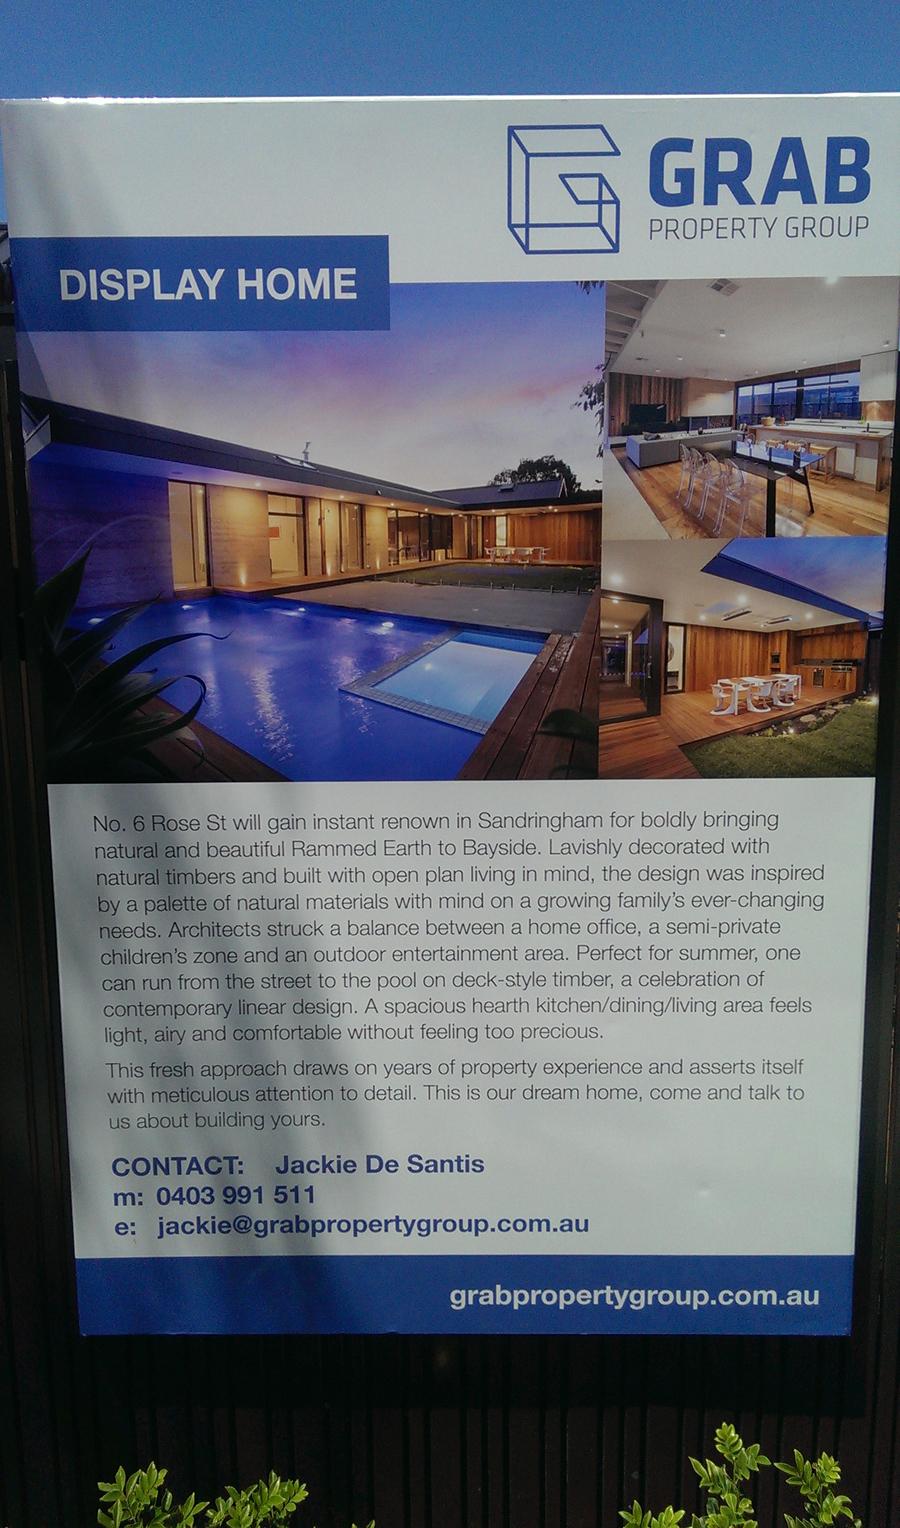 grab-property-real-estate-copywriting.jpg